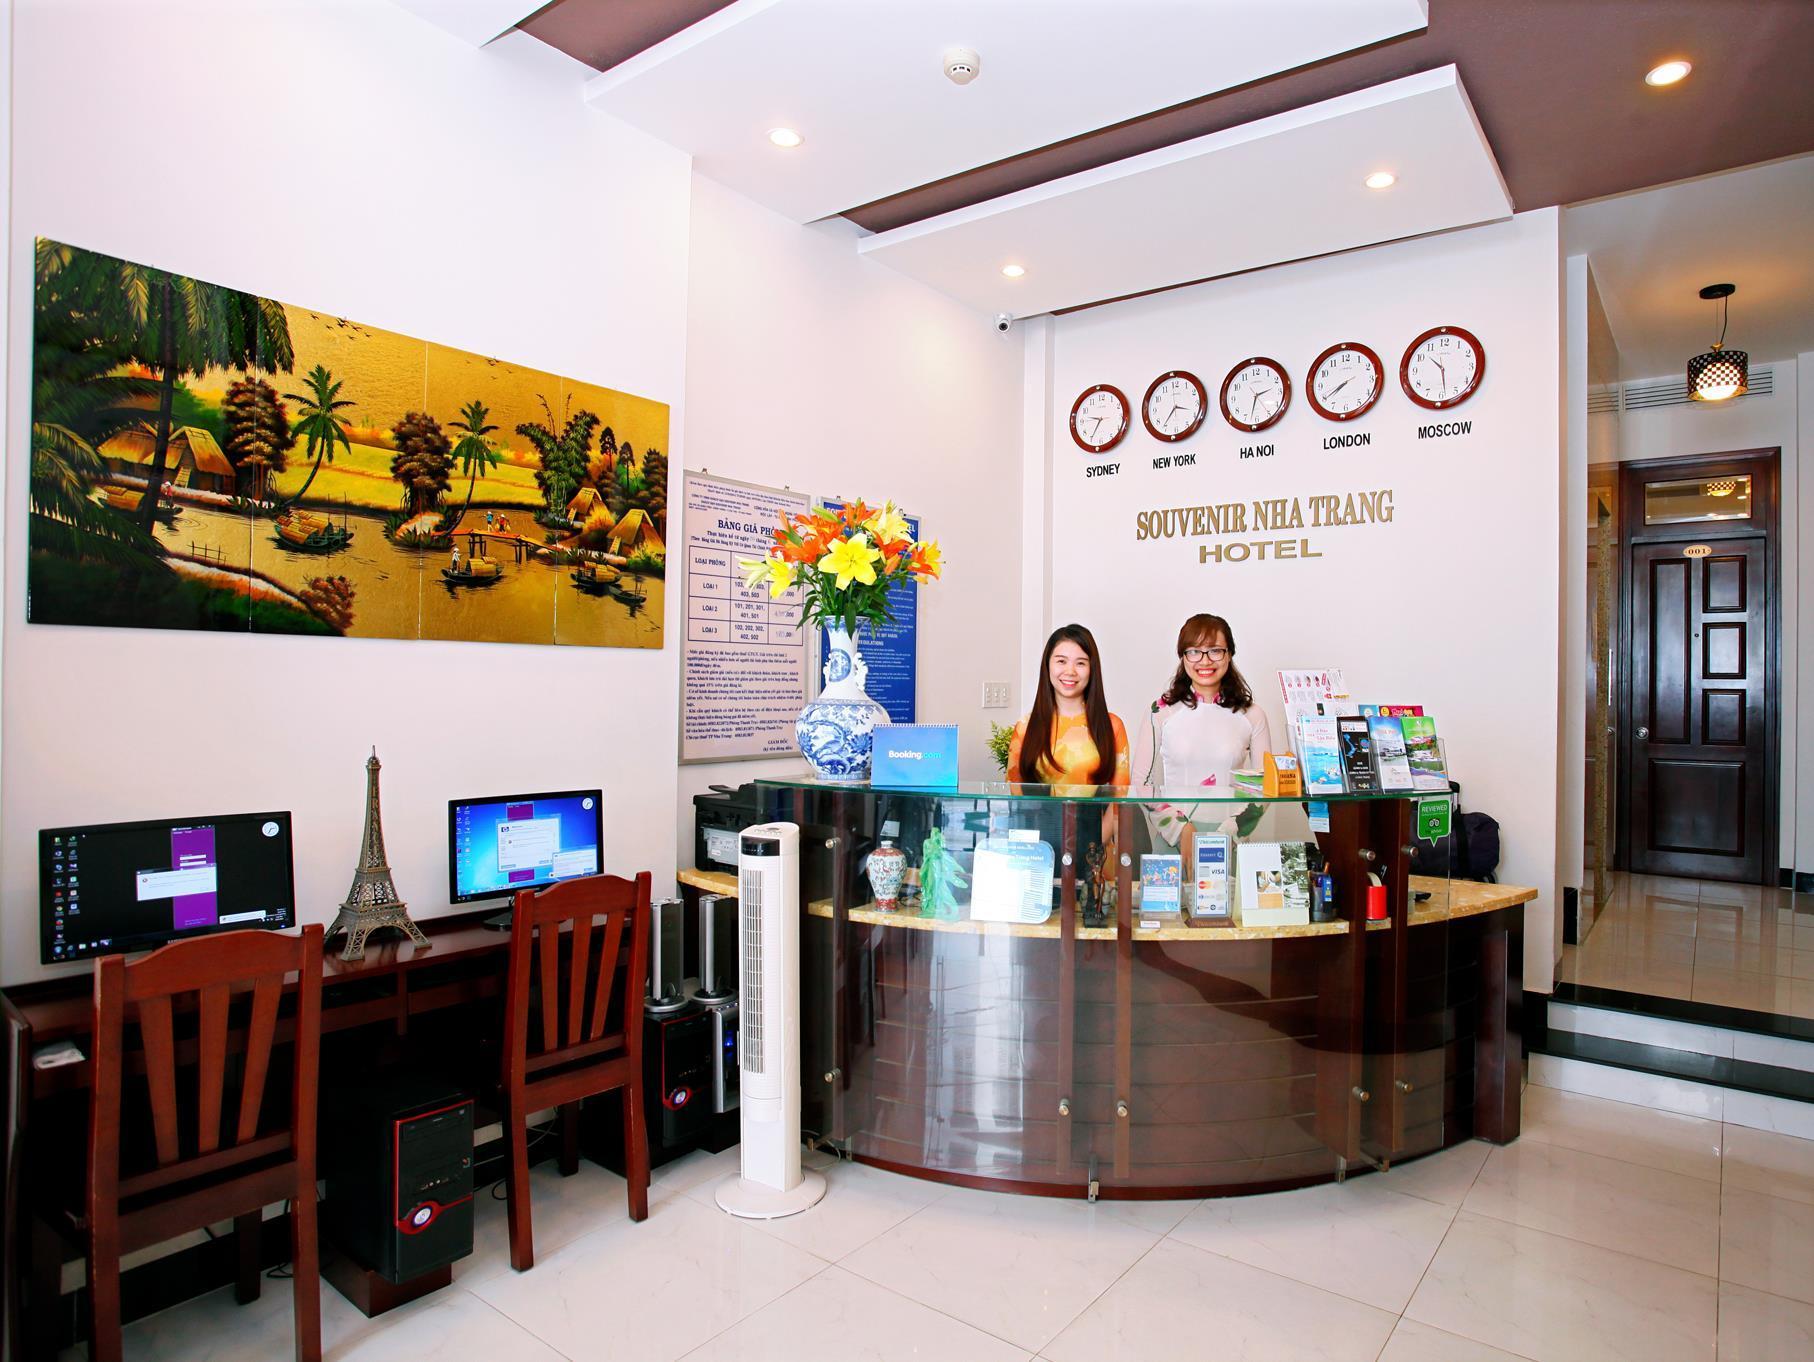 Hotell Souvenir Nha Trang Hotel